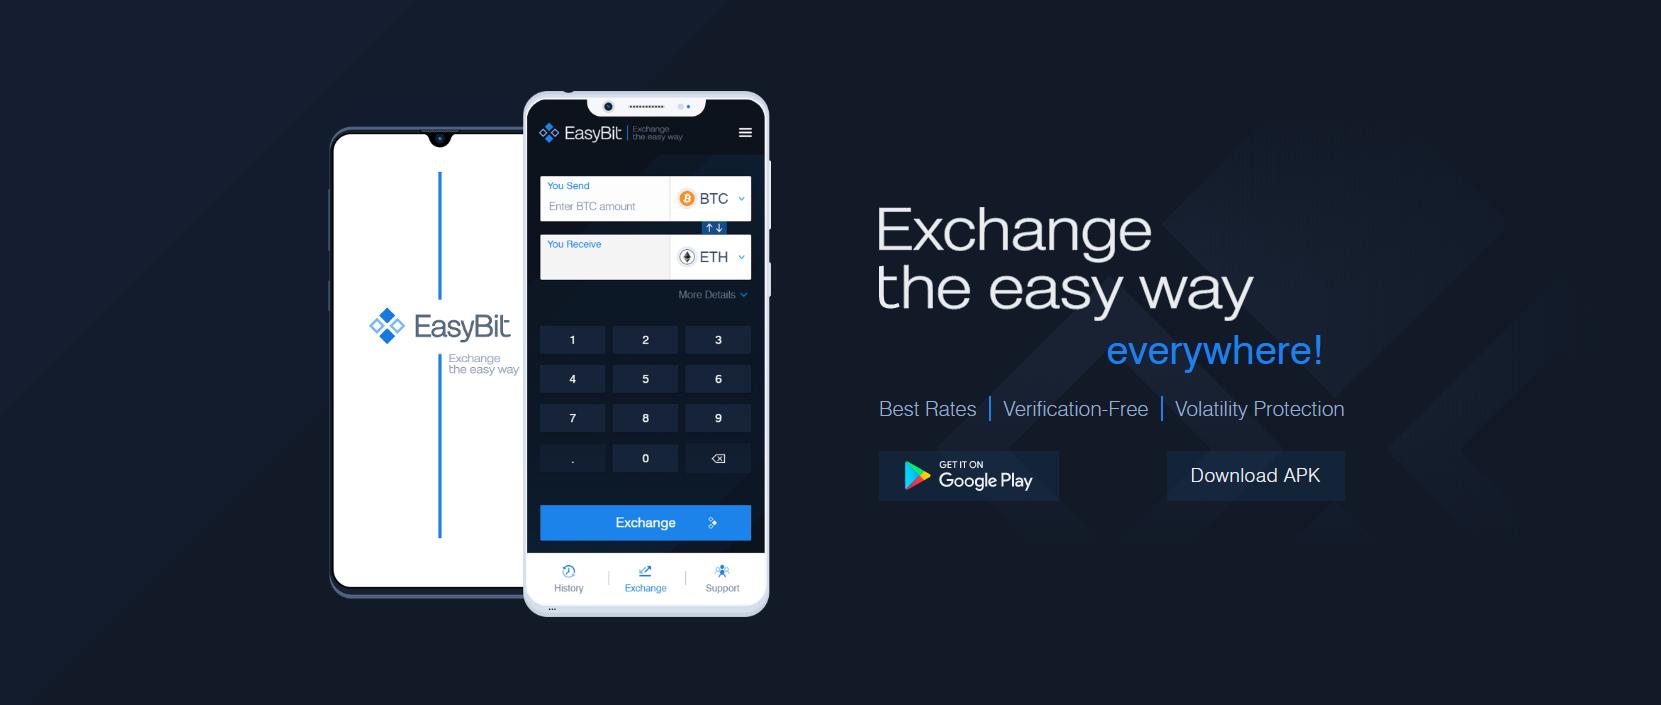 Easybit Mobile App